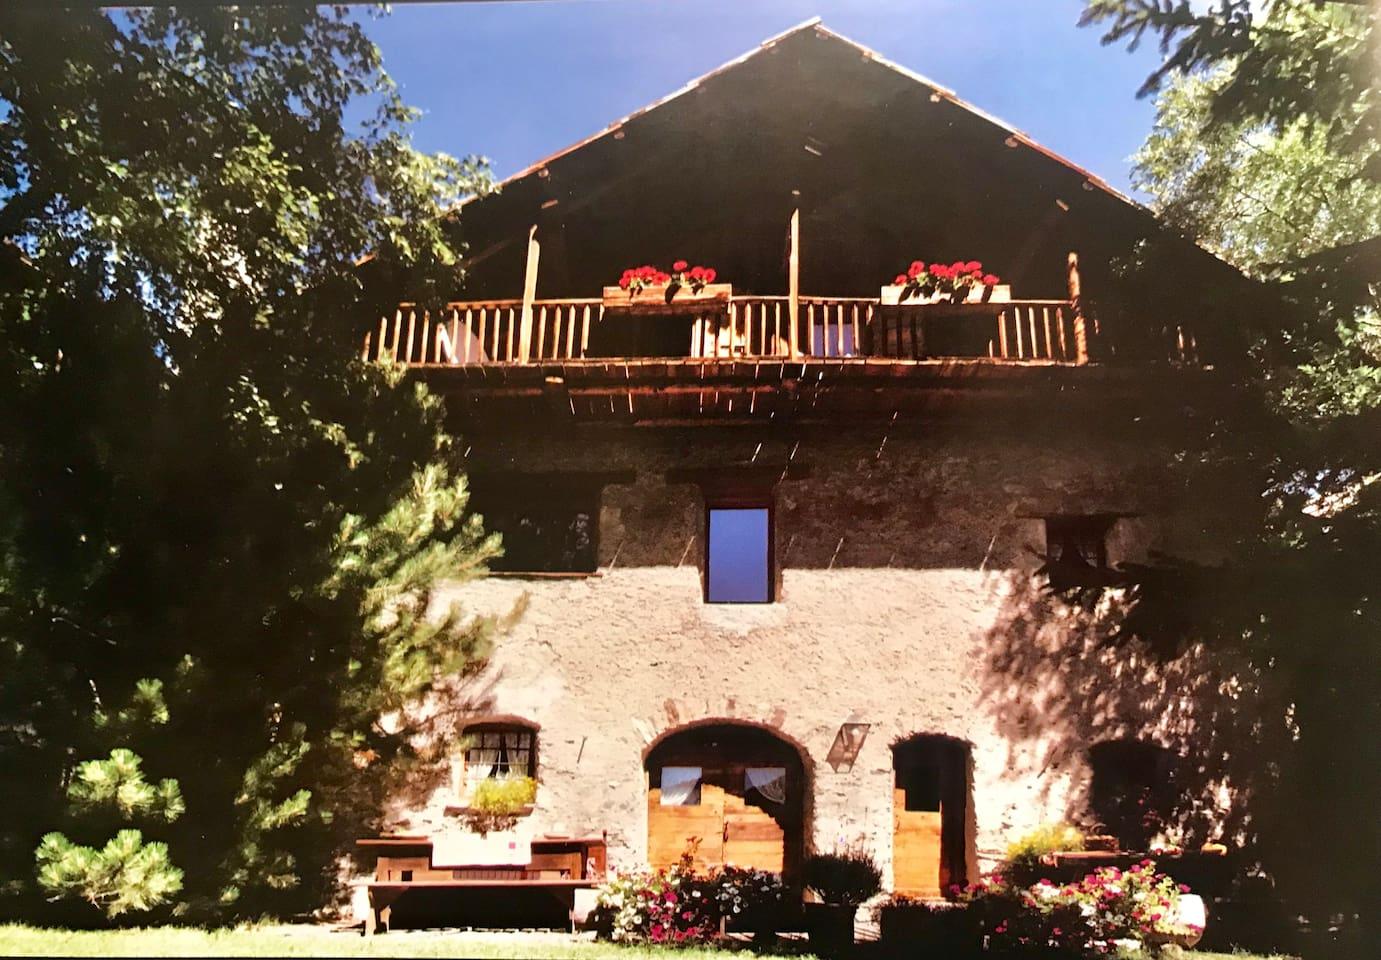 Front side of La Grangia